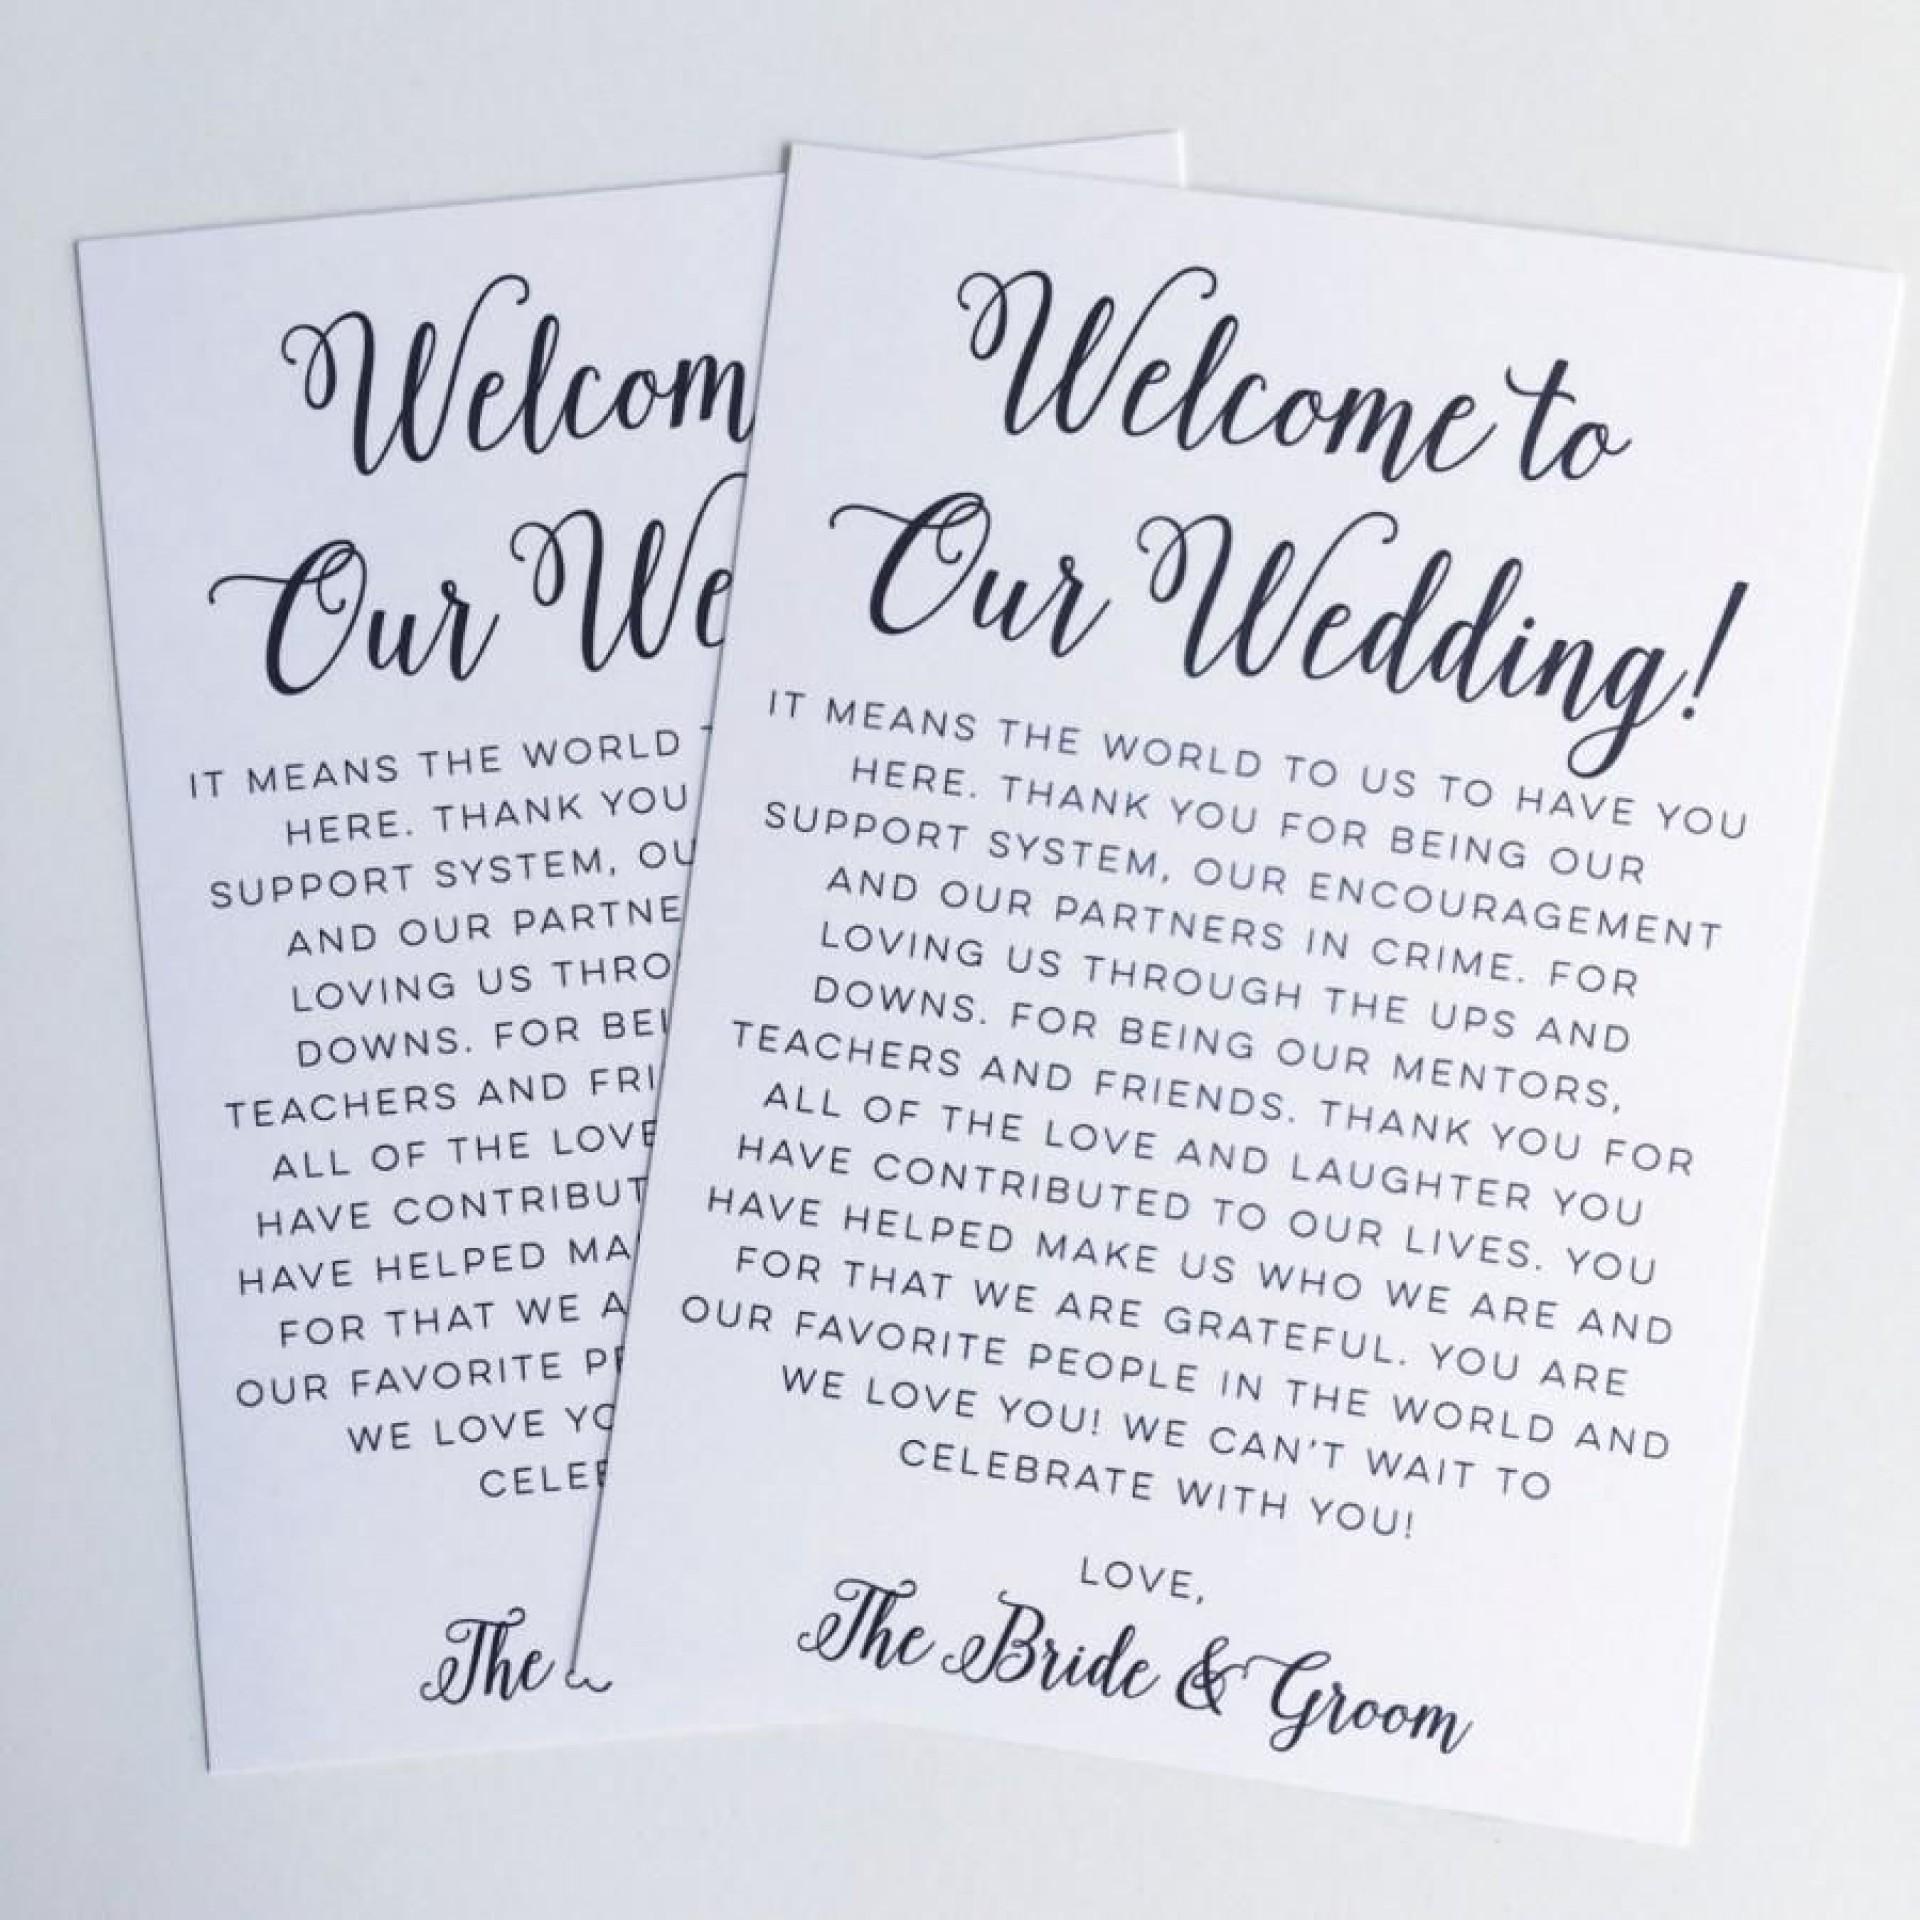 007 Wondrou Free Destination Wedding Welcome Letter Template Design 1920